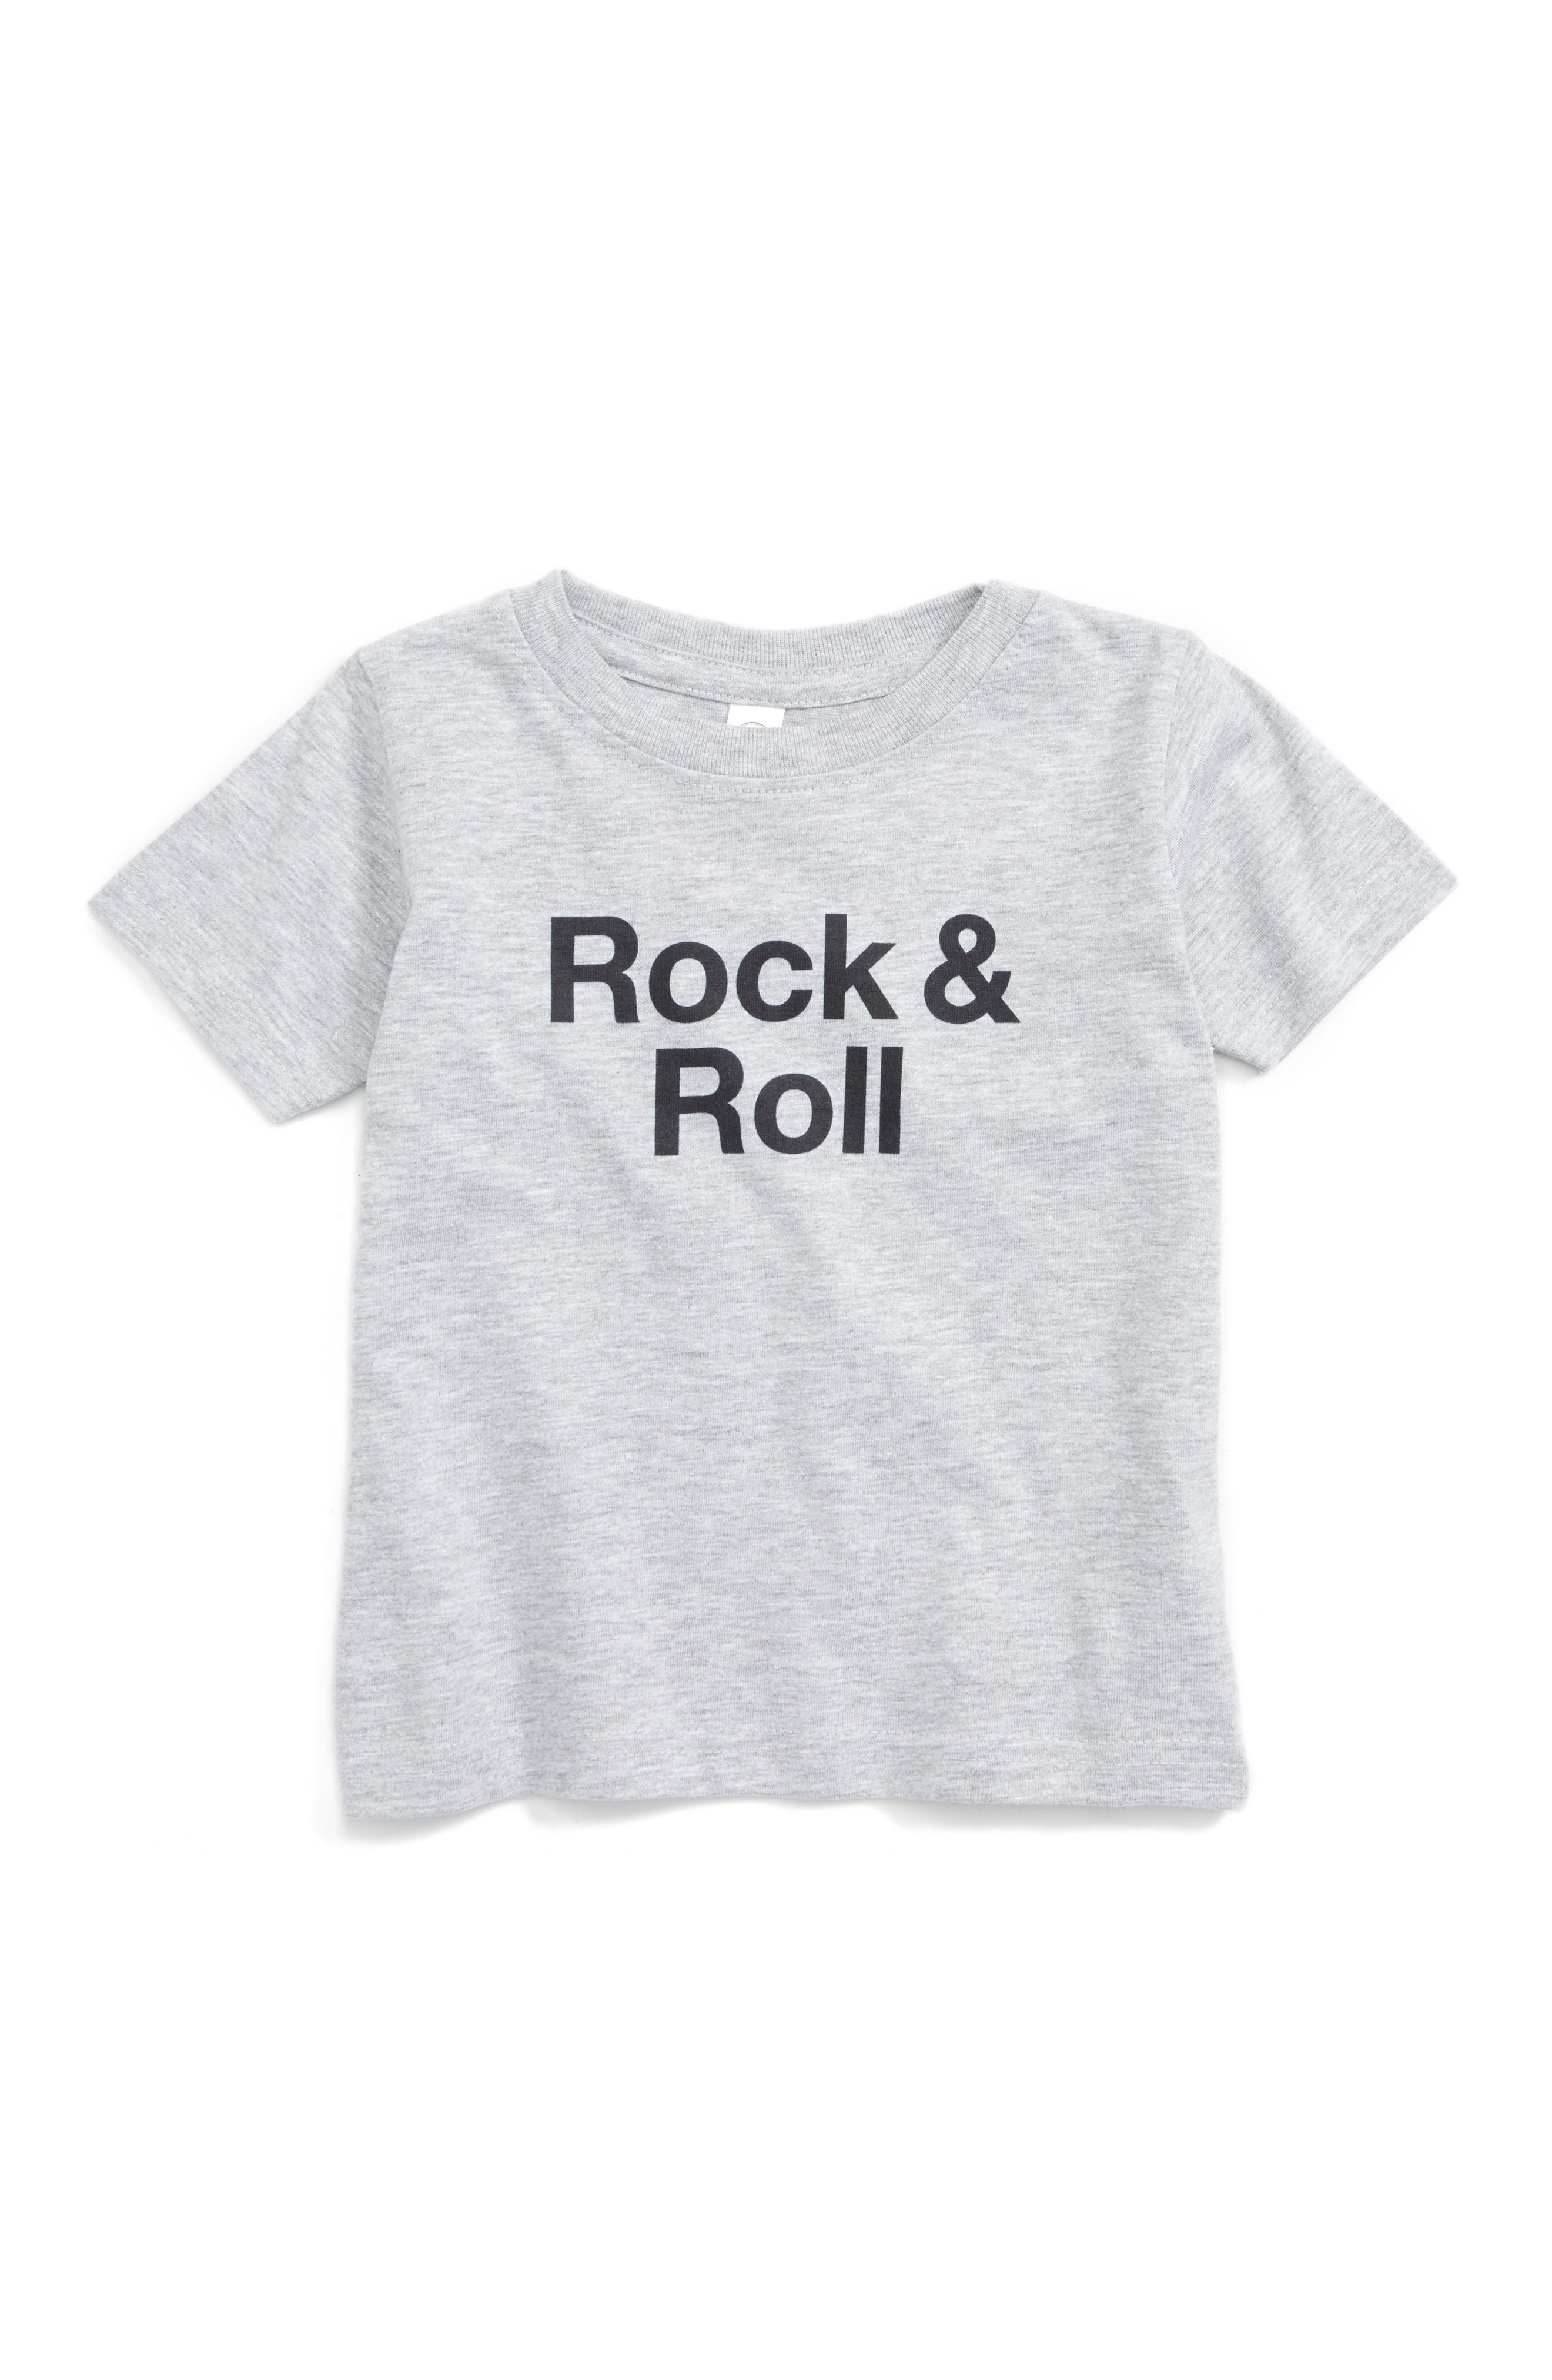 Alternate Image 1 Selected - Kid Dangerous Rock & Roll Graphic T-Shirt (Baby Boys)